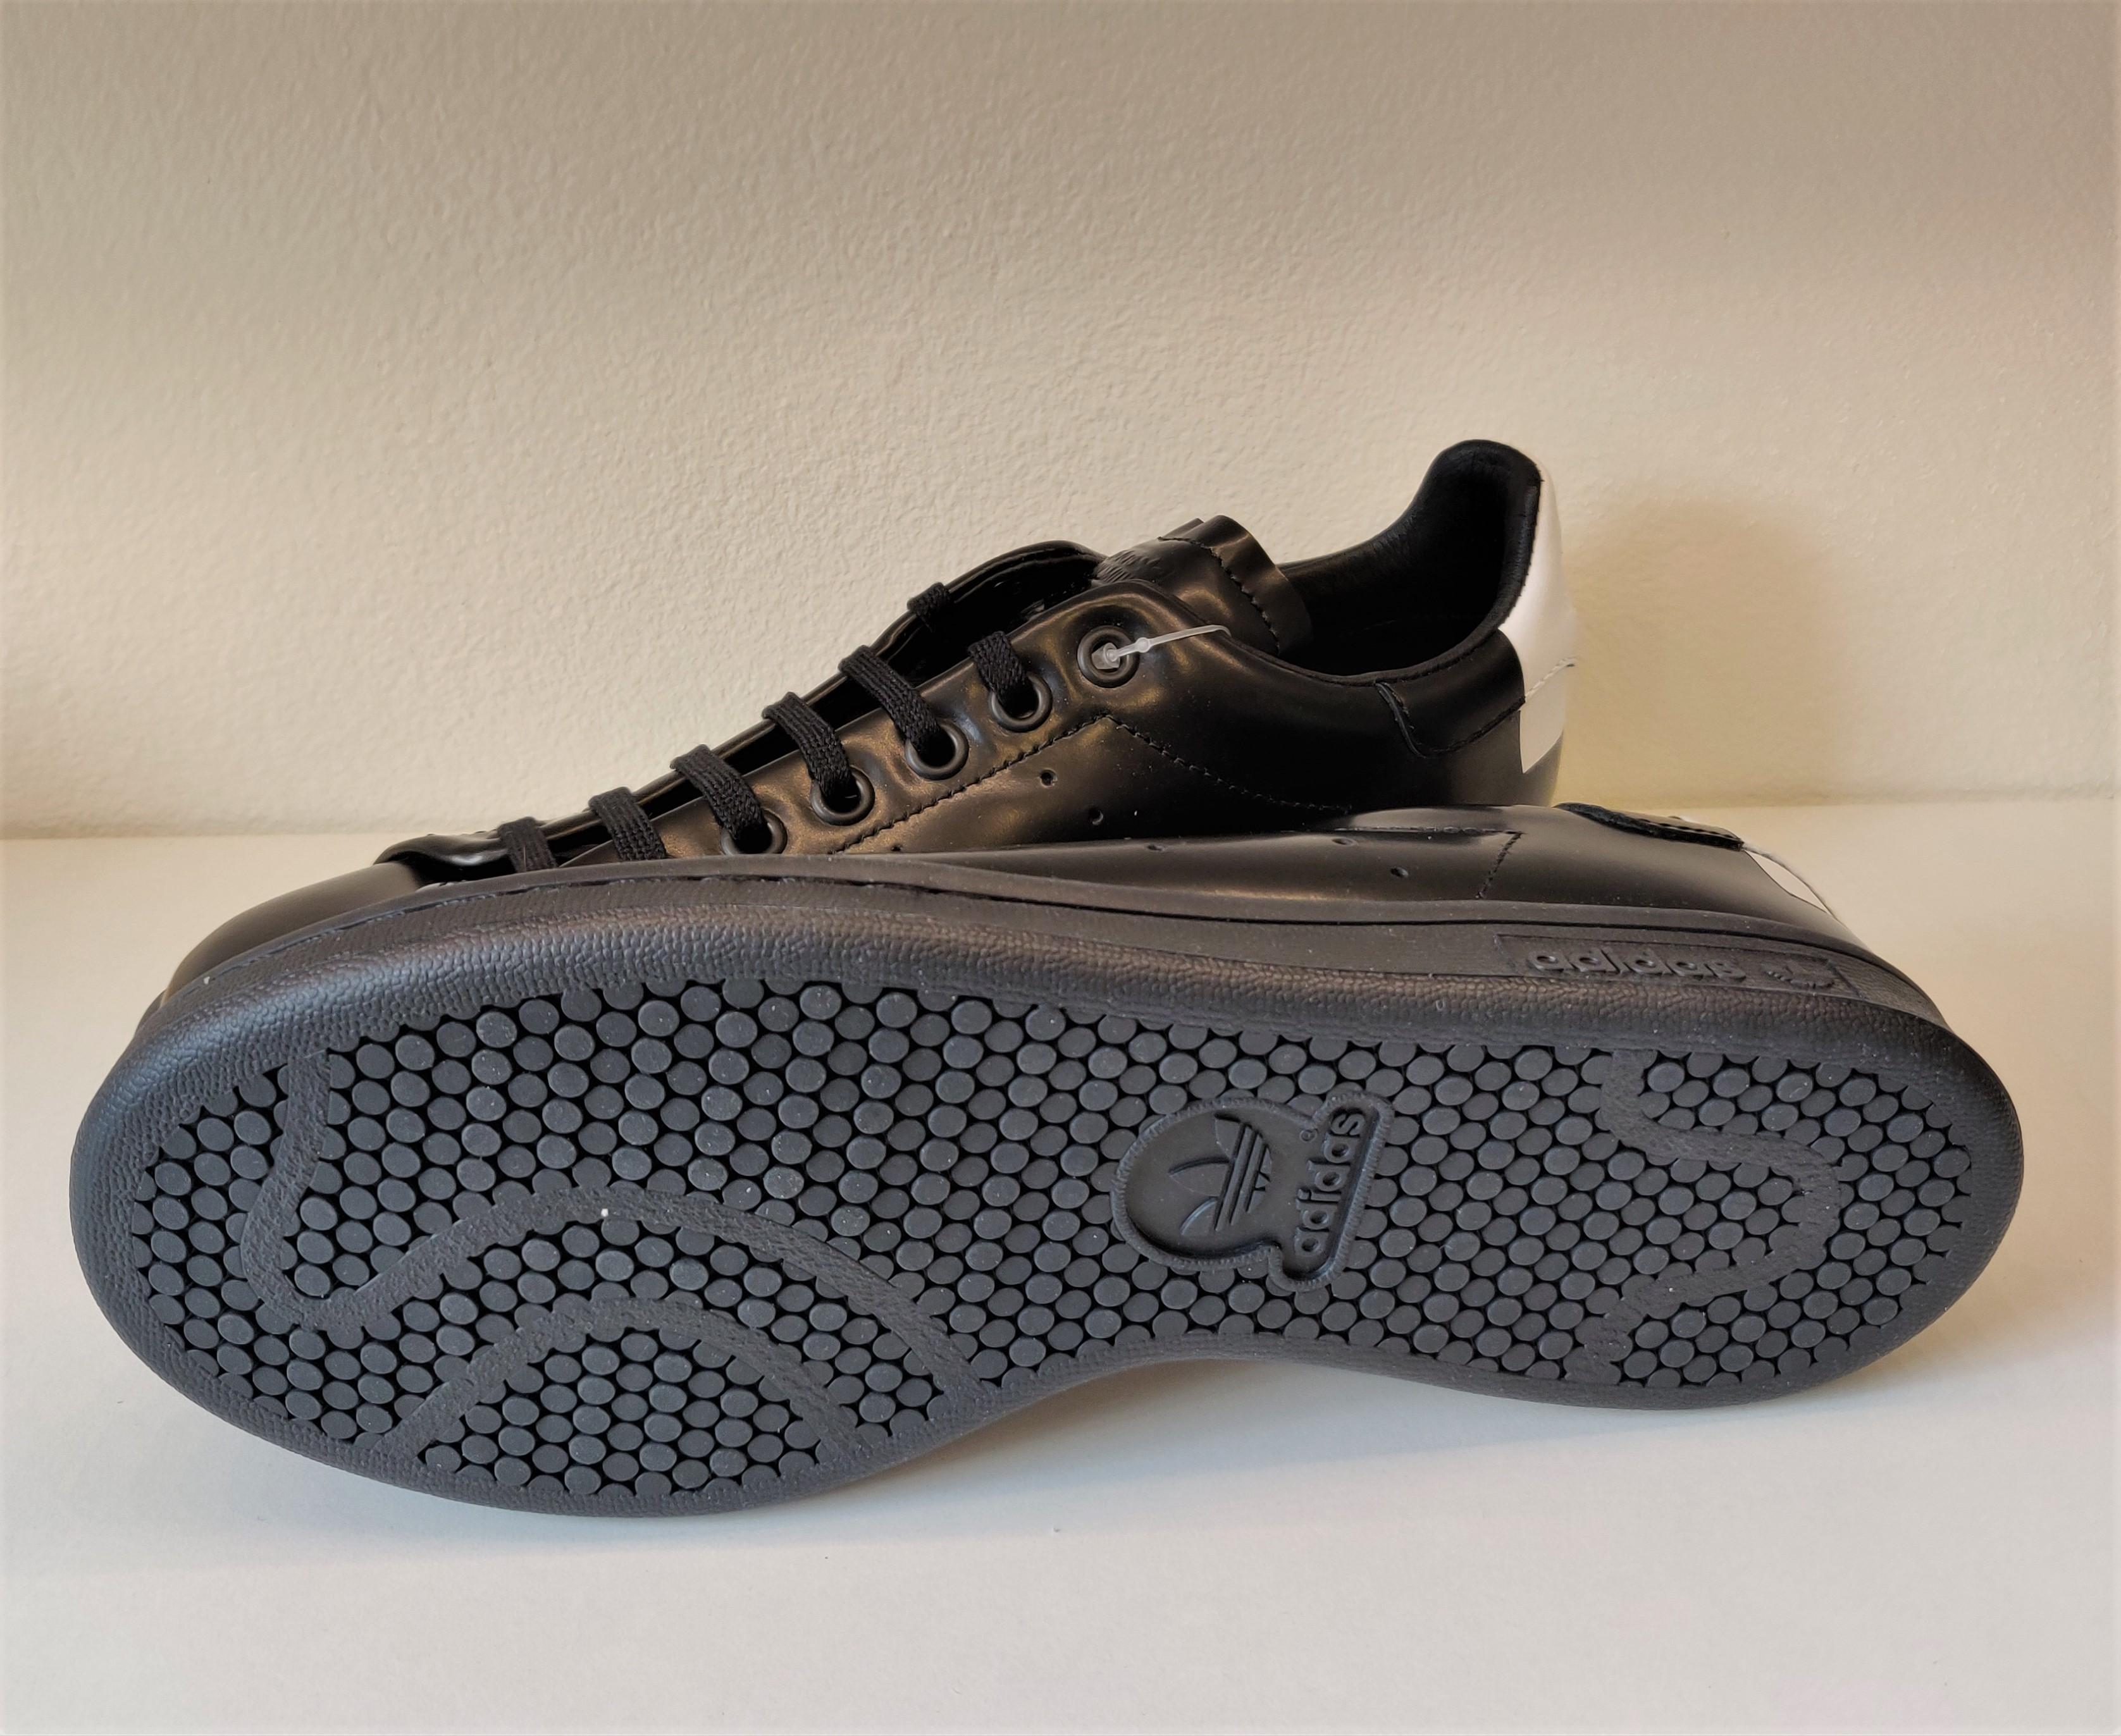 Adidas Stan Smith Recon